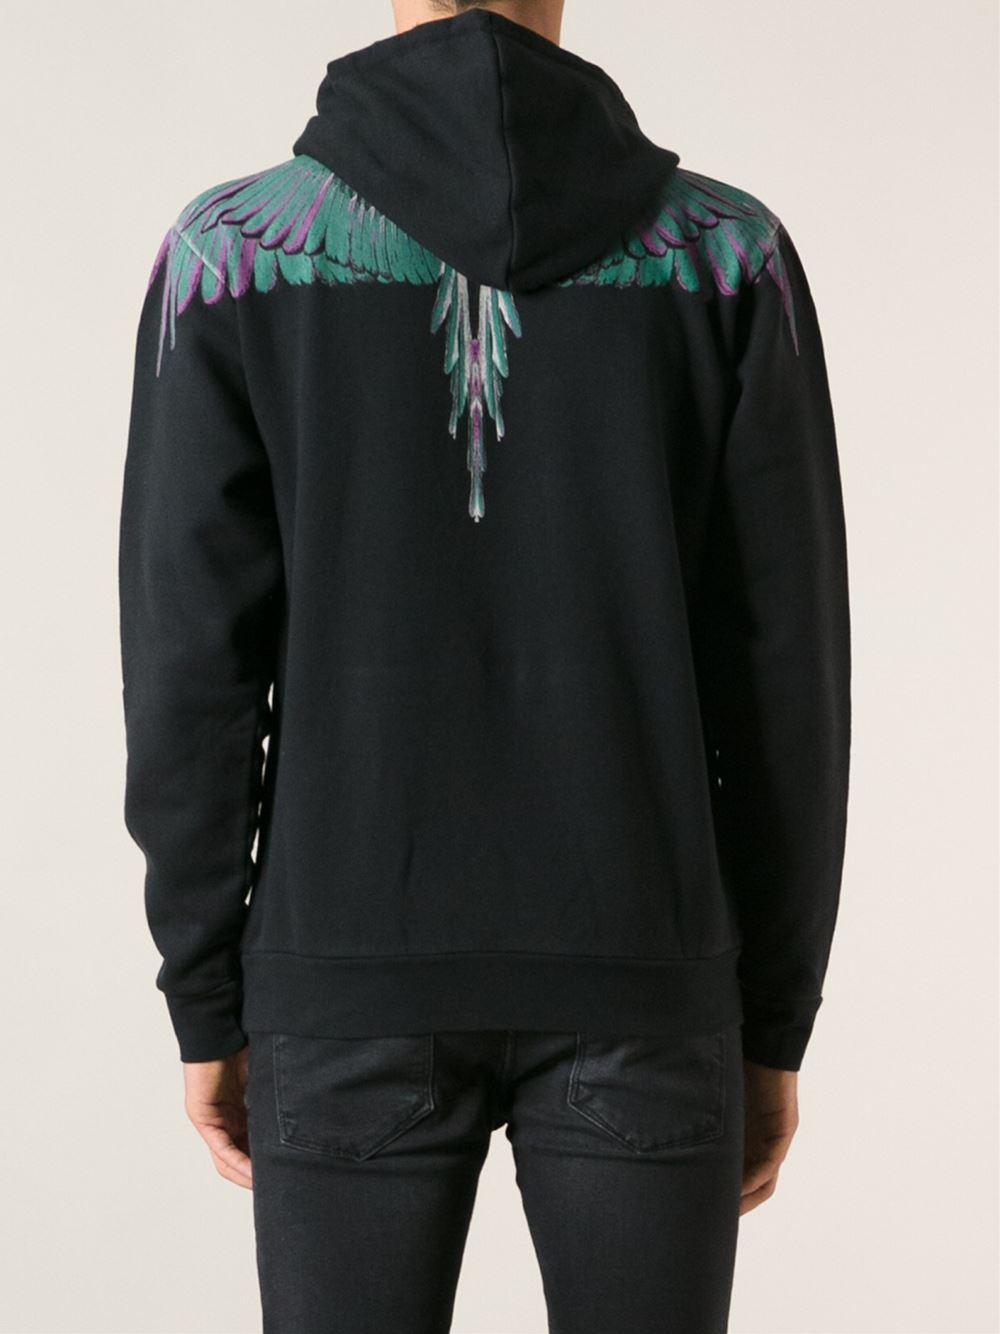 Marcelo Burlon Cotton Feathers Print Hoodie in Black for Men